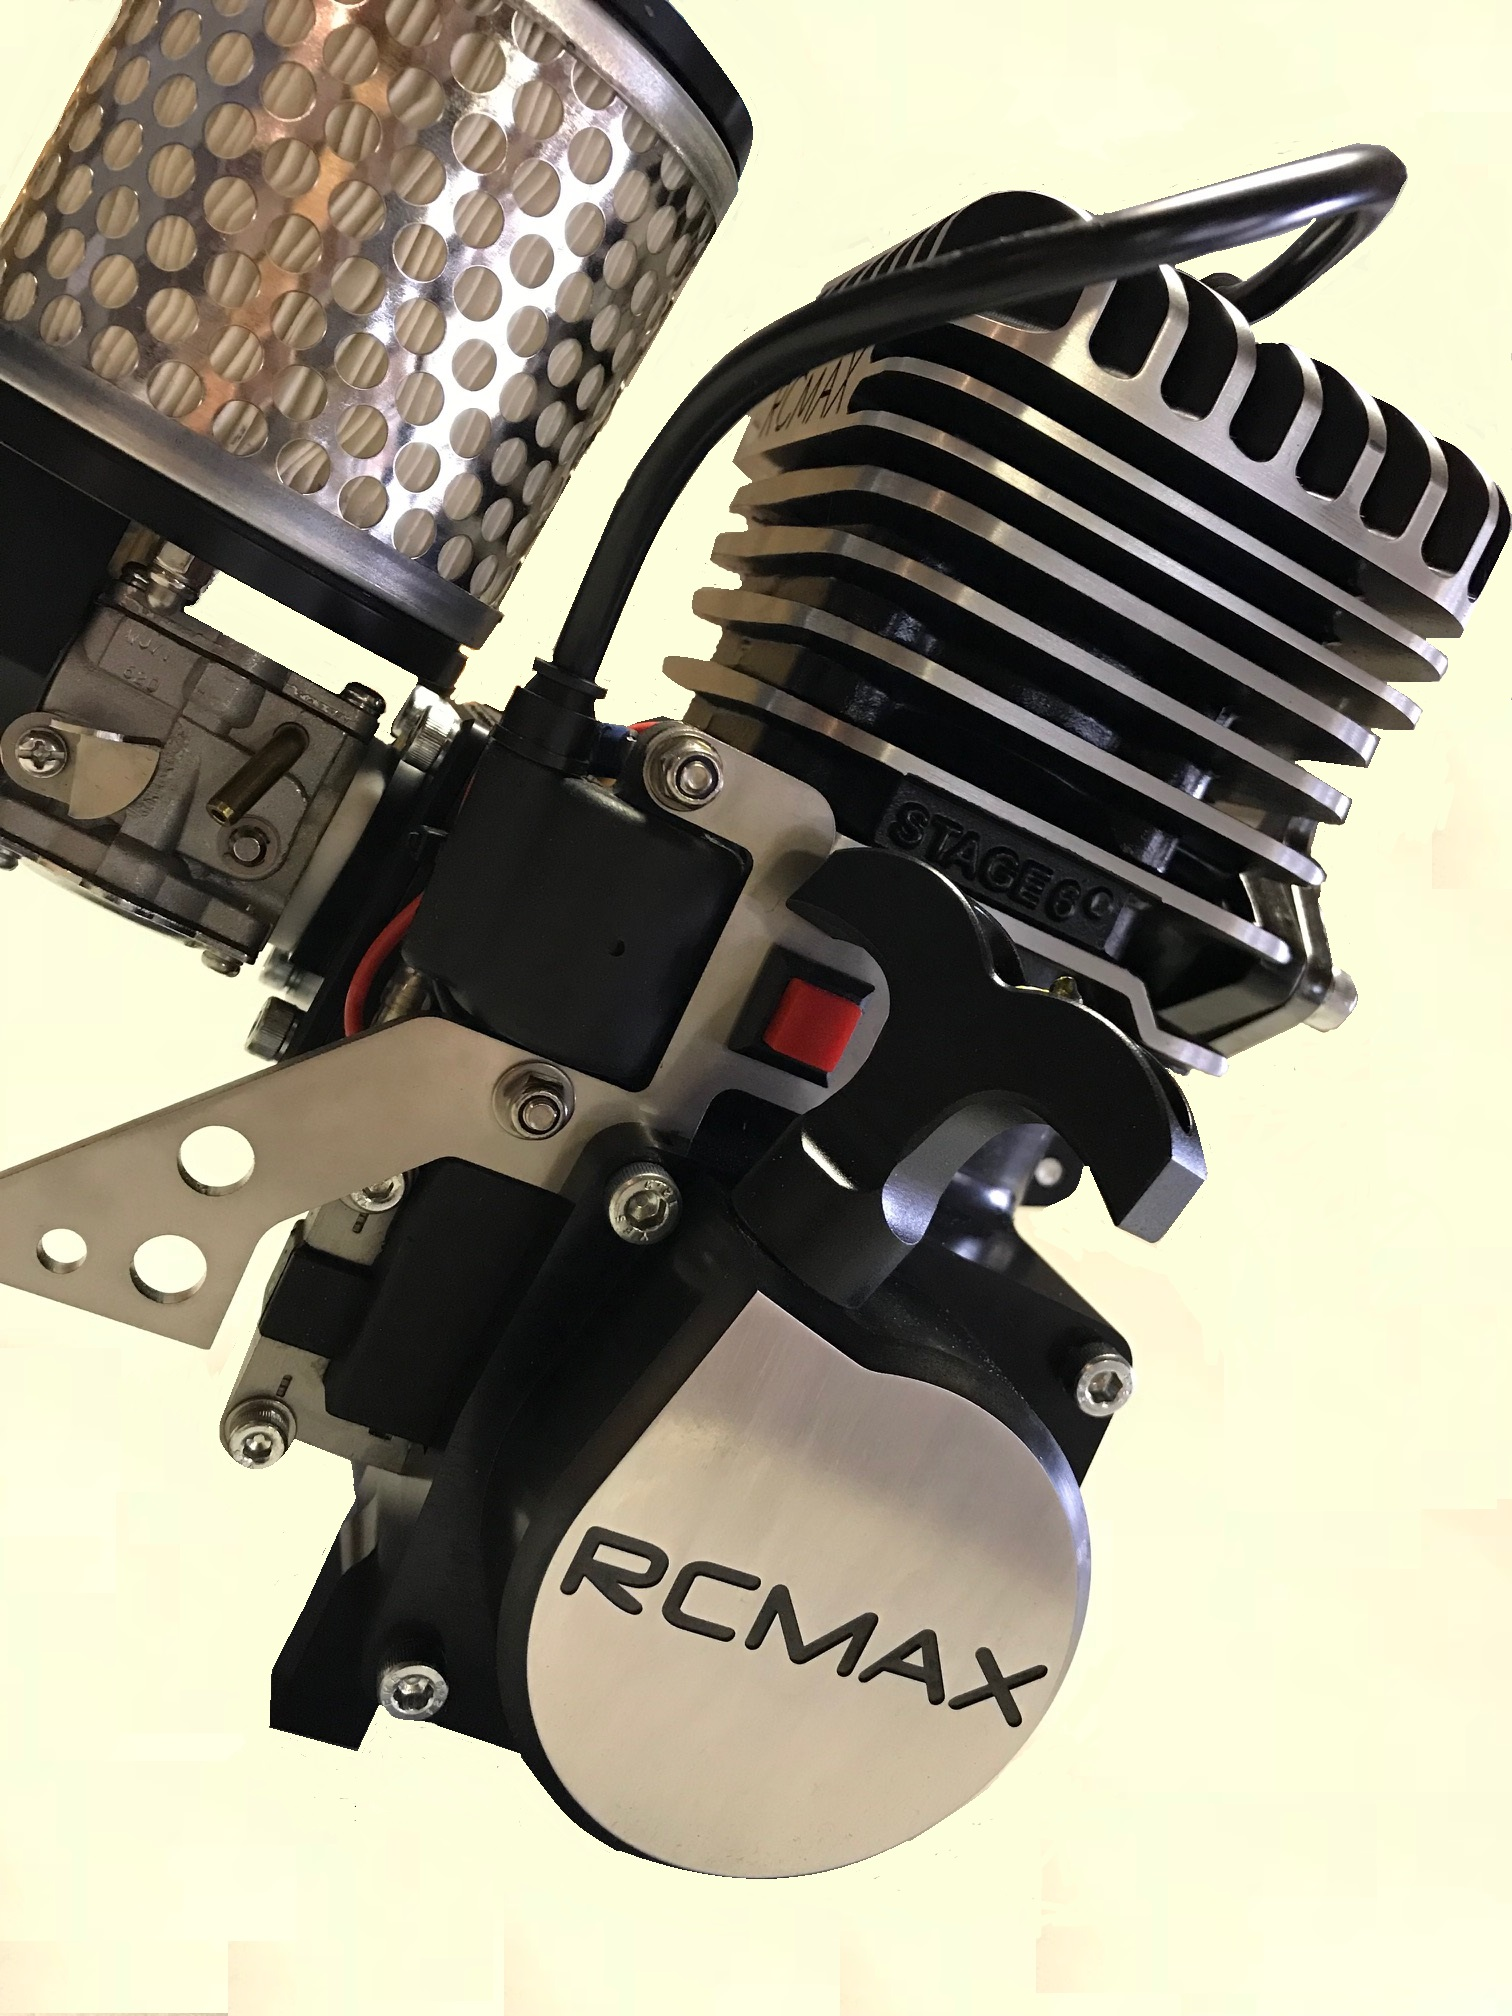 RCMAX65